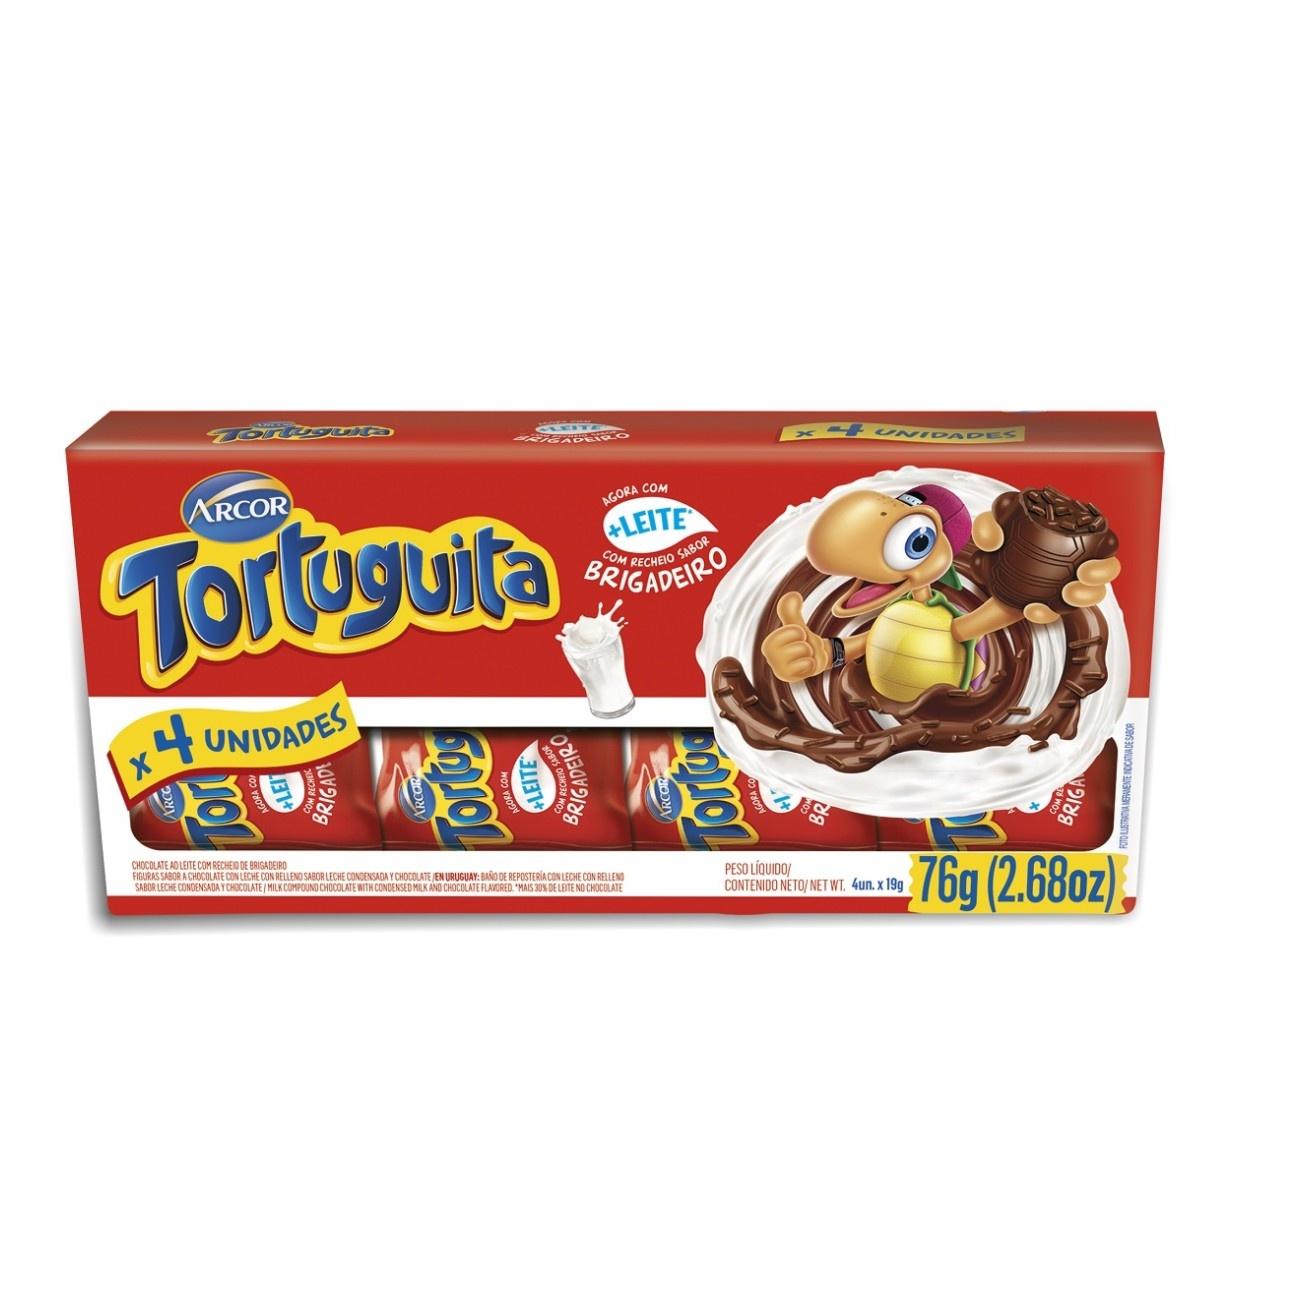 Display de Chocolate Tortuguita Brigadeiro 19g (4 UN/CADA)